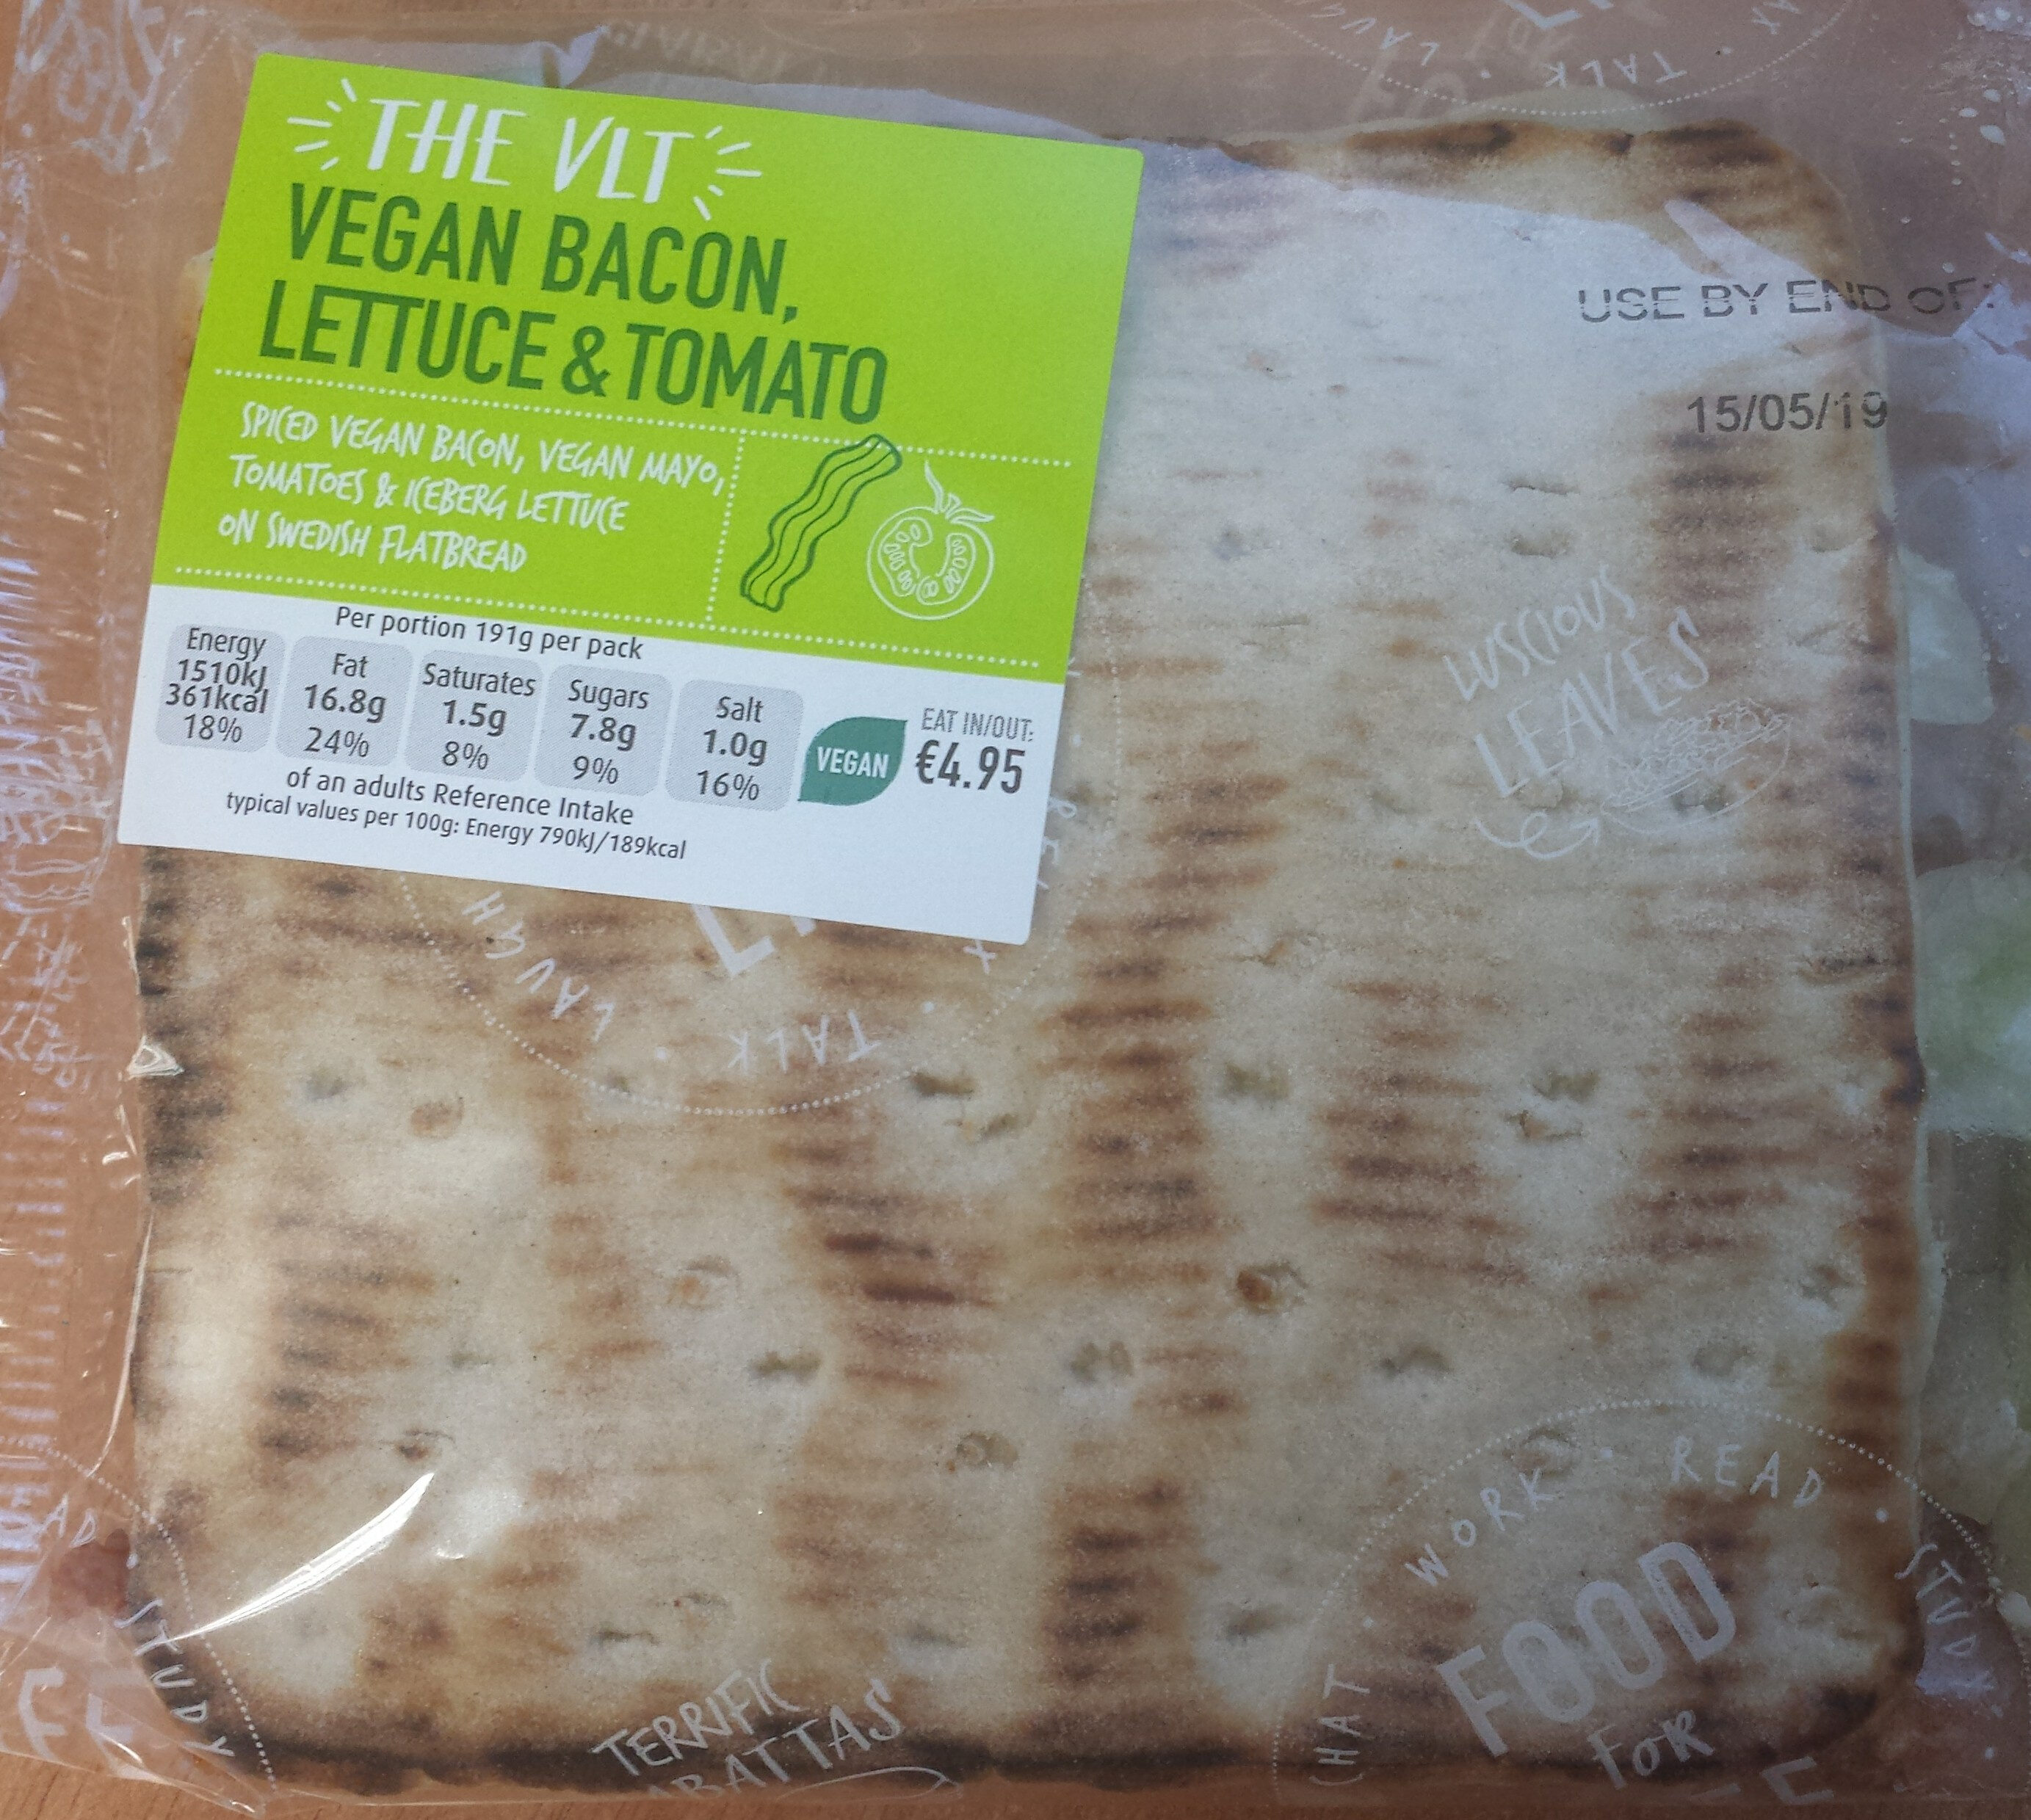 The VLT - Vegan Bacon, lettuce and tomato - Product